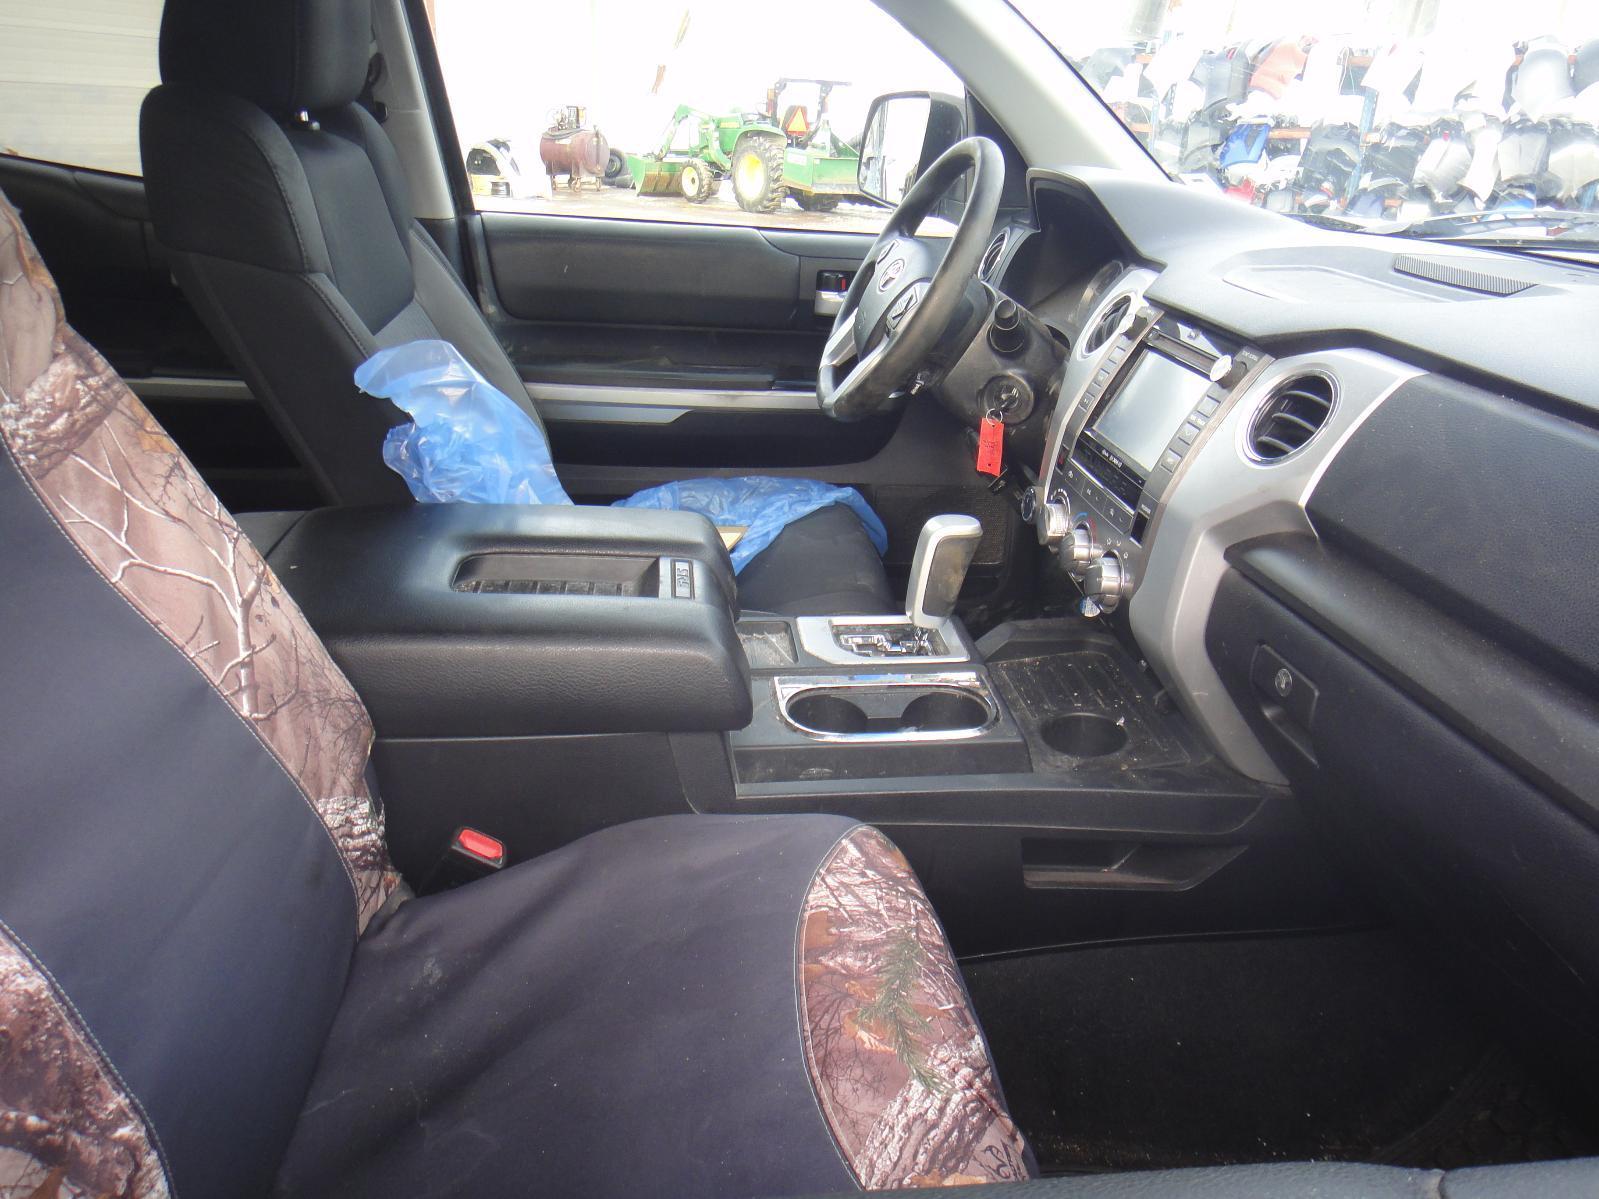 2014 Toyota Tundra TRD 4×4 full